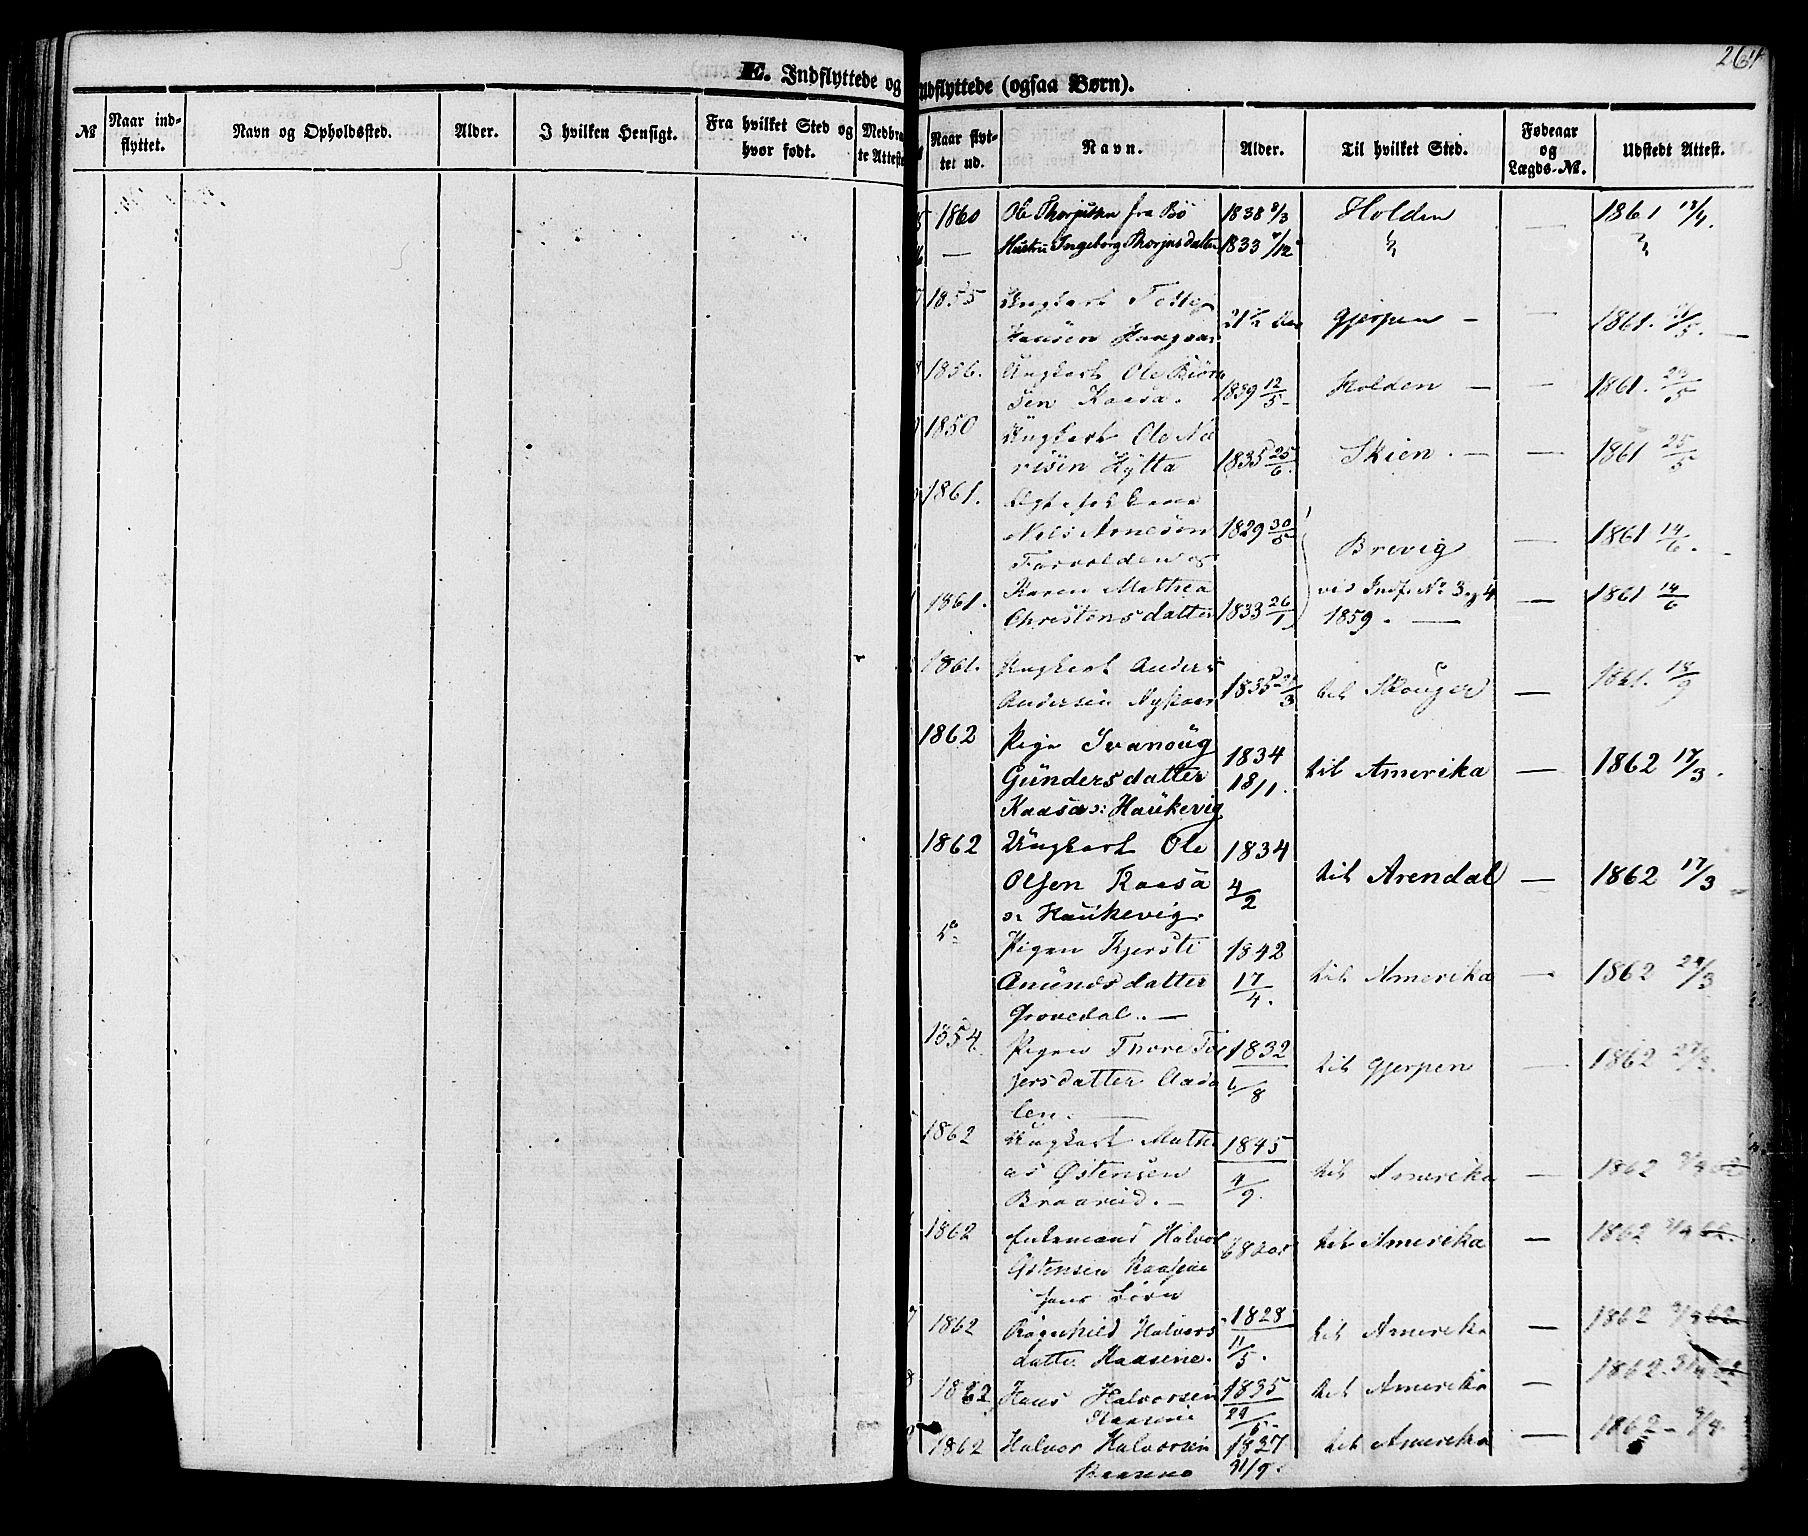 SAKO, Sauherad kirkebøker, F/Fa/L0007: Ministerialbok nr. I 7, 1851-1873, s. 264